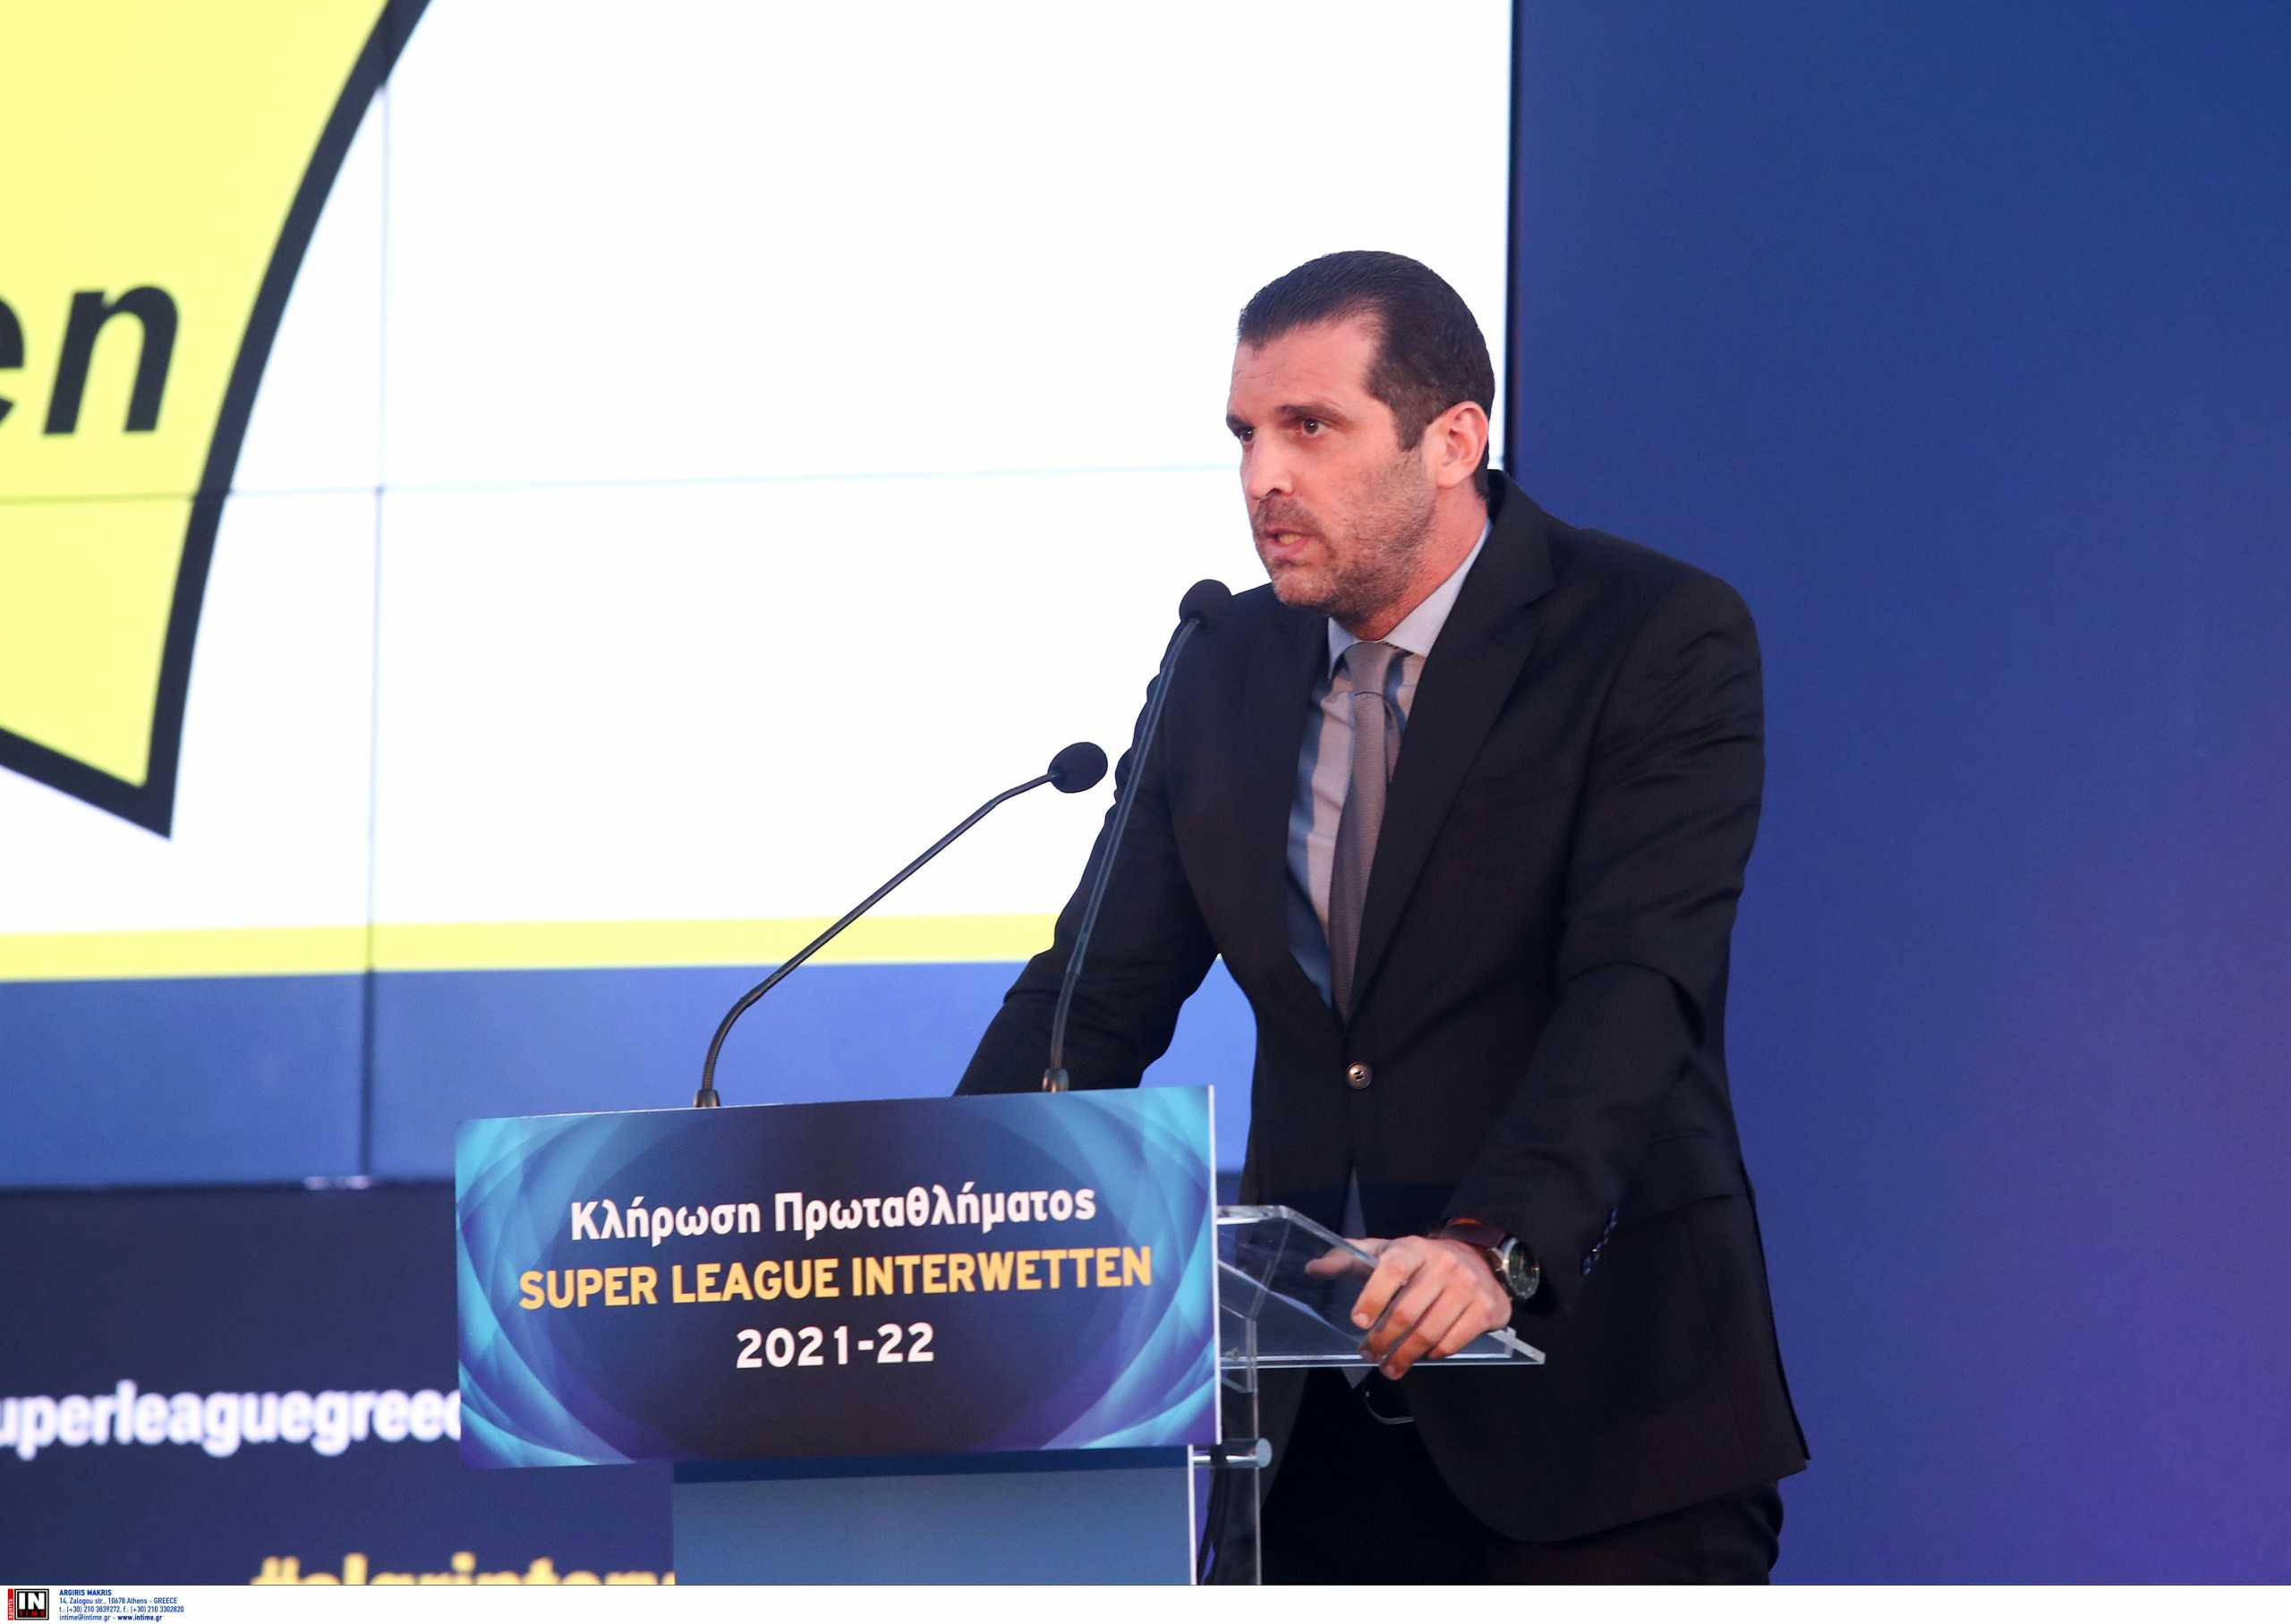 Superleague: «Πιστεύω θα λυθεί το θέμα των τηλεοπτικών» δήλωσε ο Μπουτσικάρης